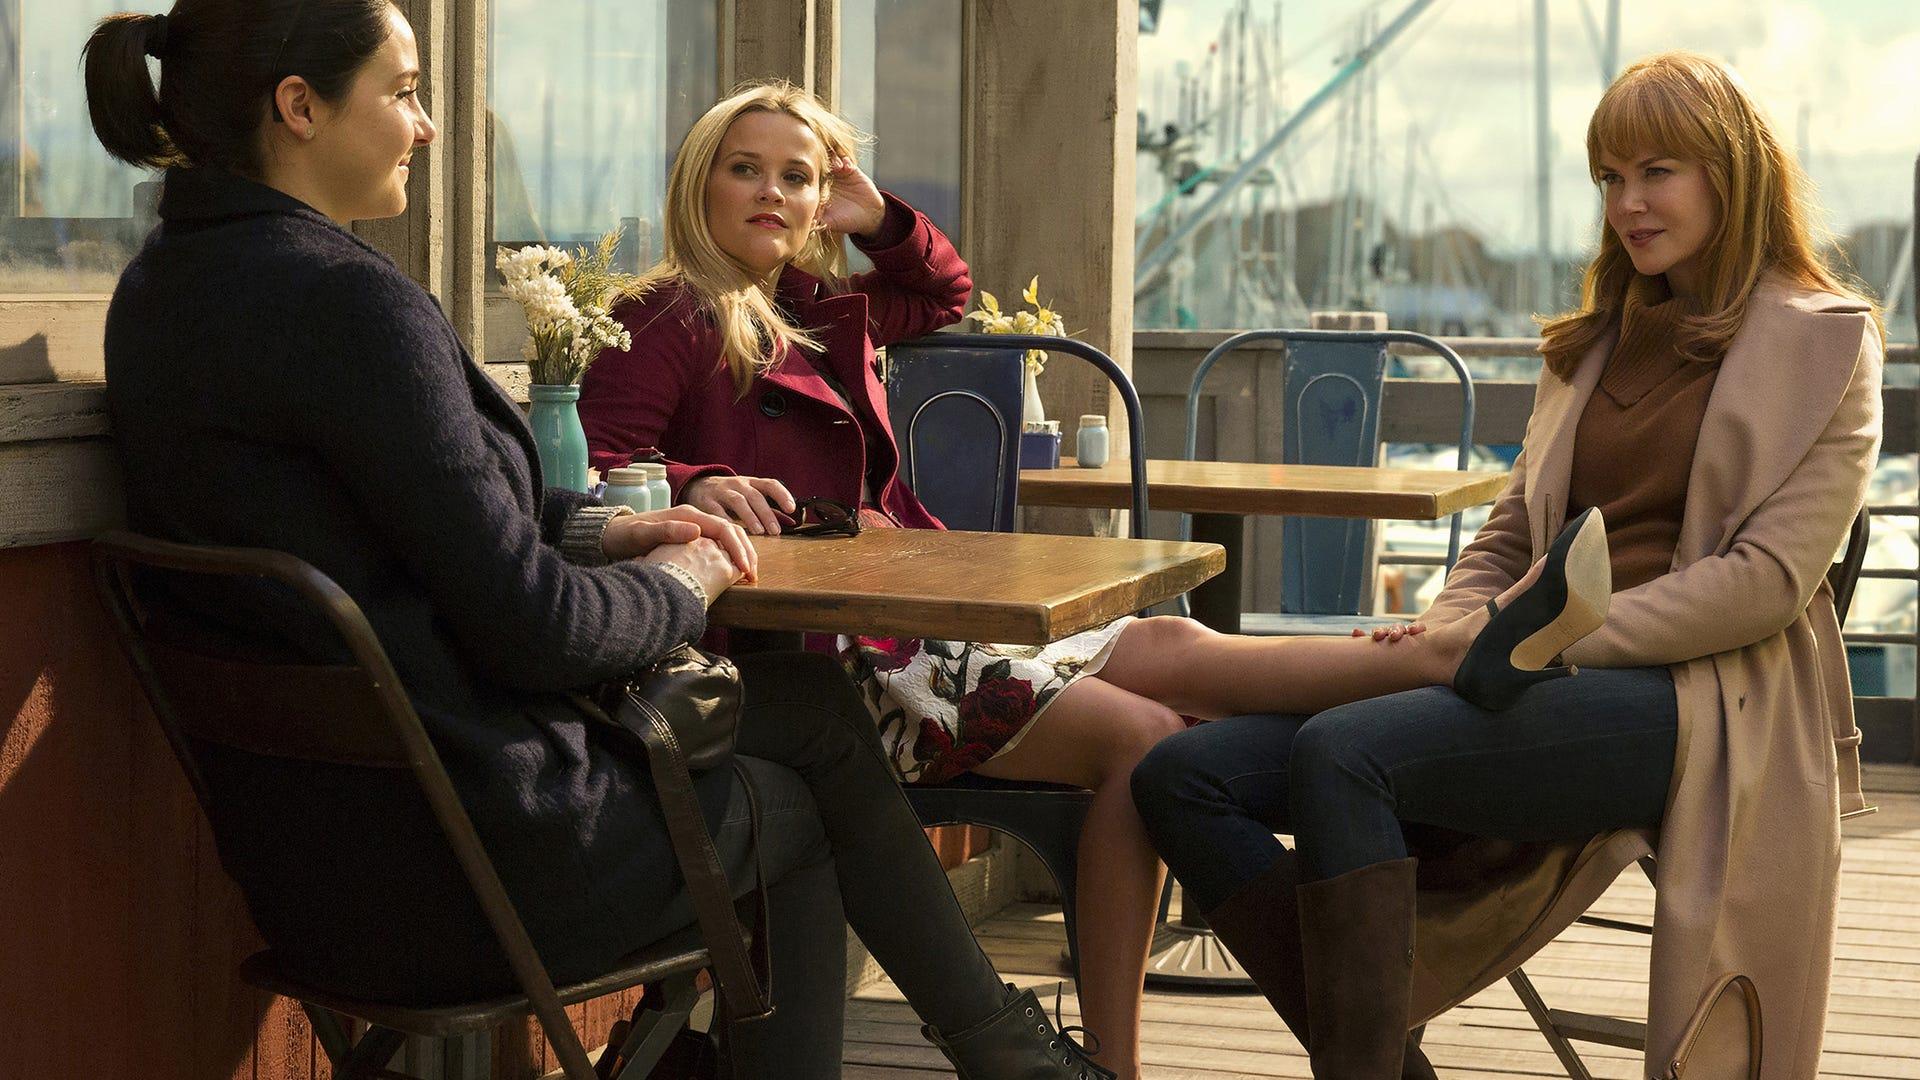 Shailene Woodley, Reese Witherspoon, Nicole Kidman; Big Little Lies